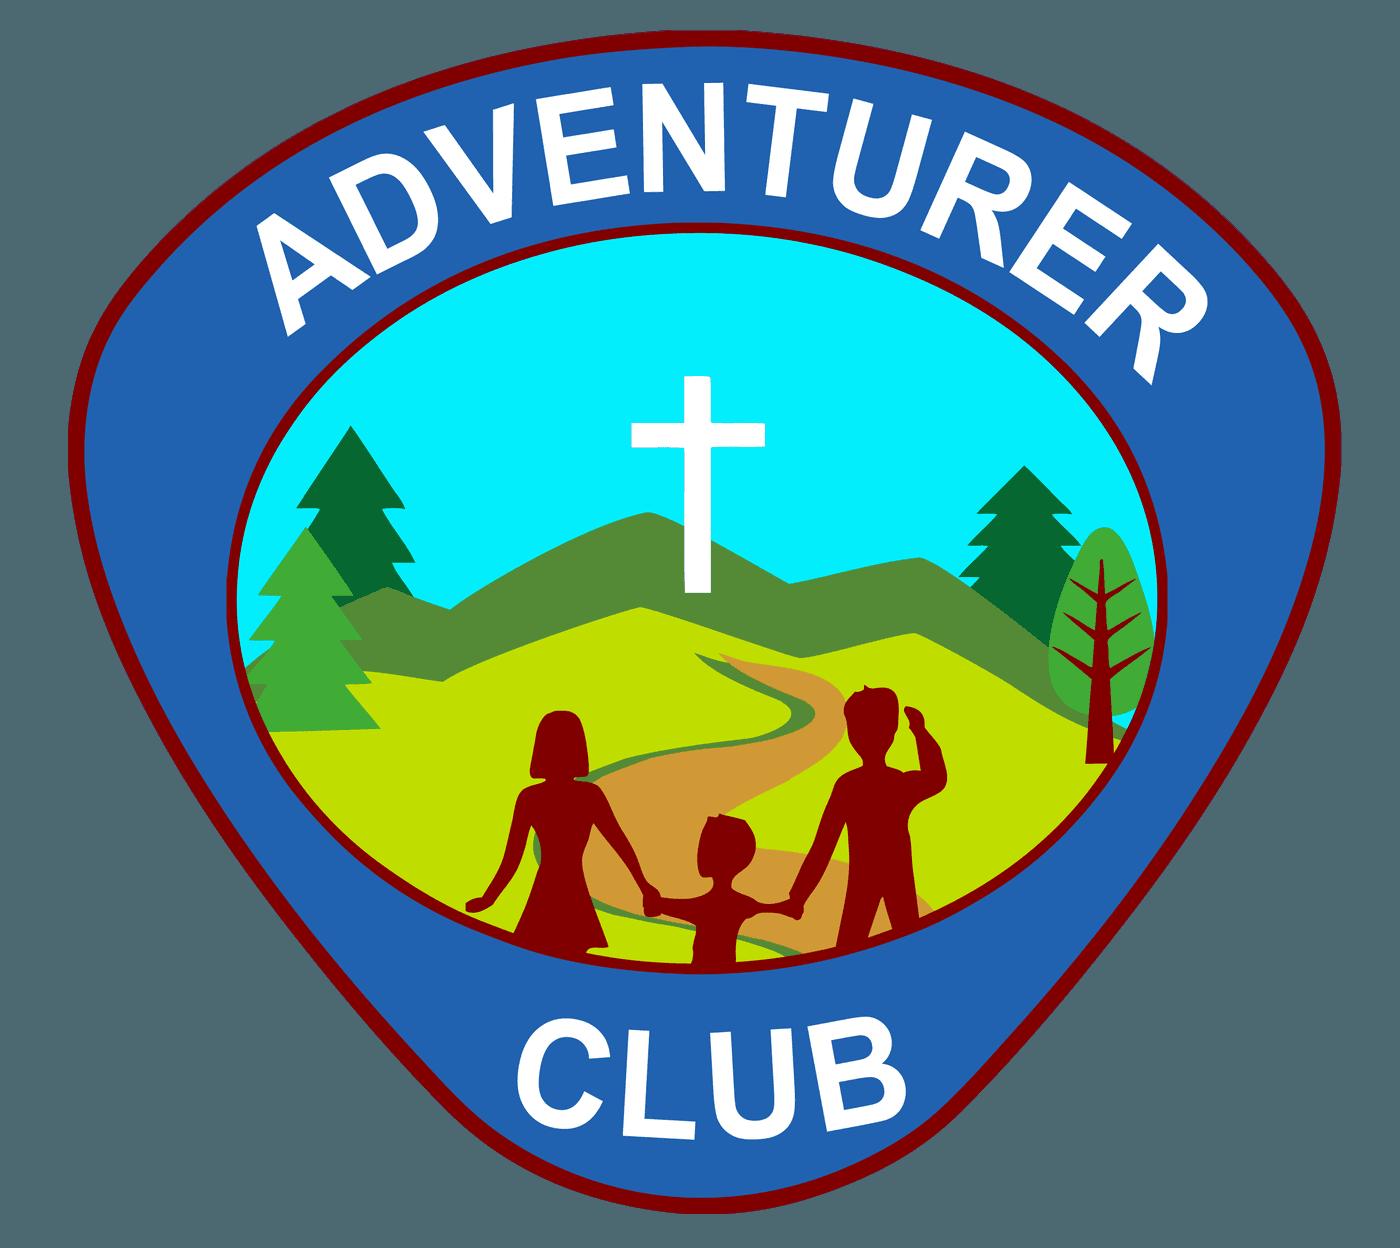 Adventurer logo